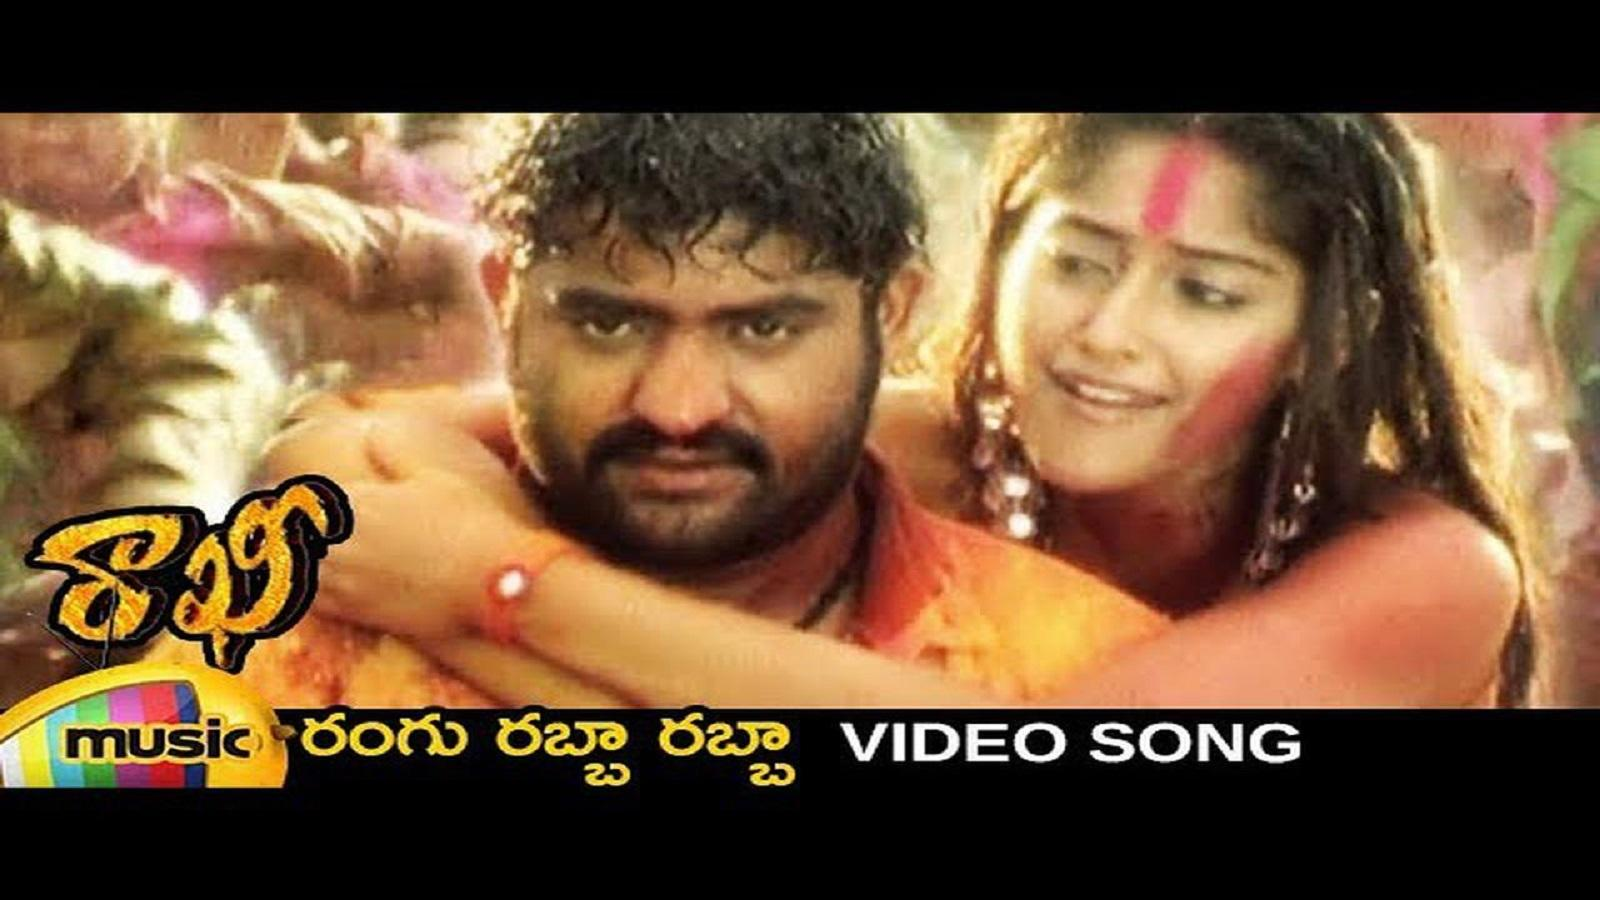 Telugu Video Song: Telugu Song 'Rangu Rabba Rabba' from 'Rakhi' Ft. Jr NTR  and Ileana D'Cruz